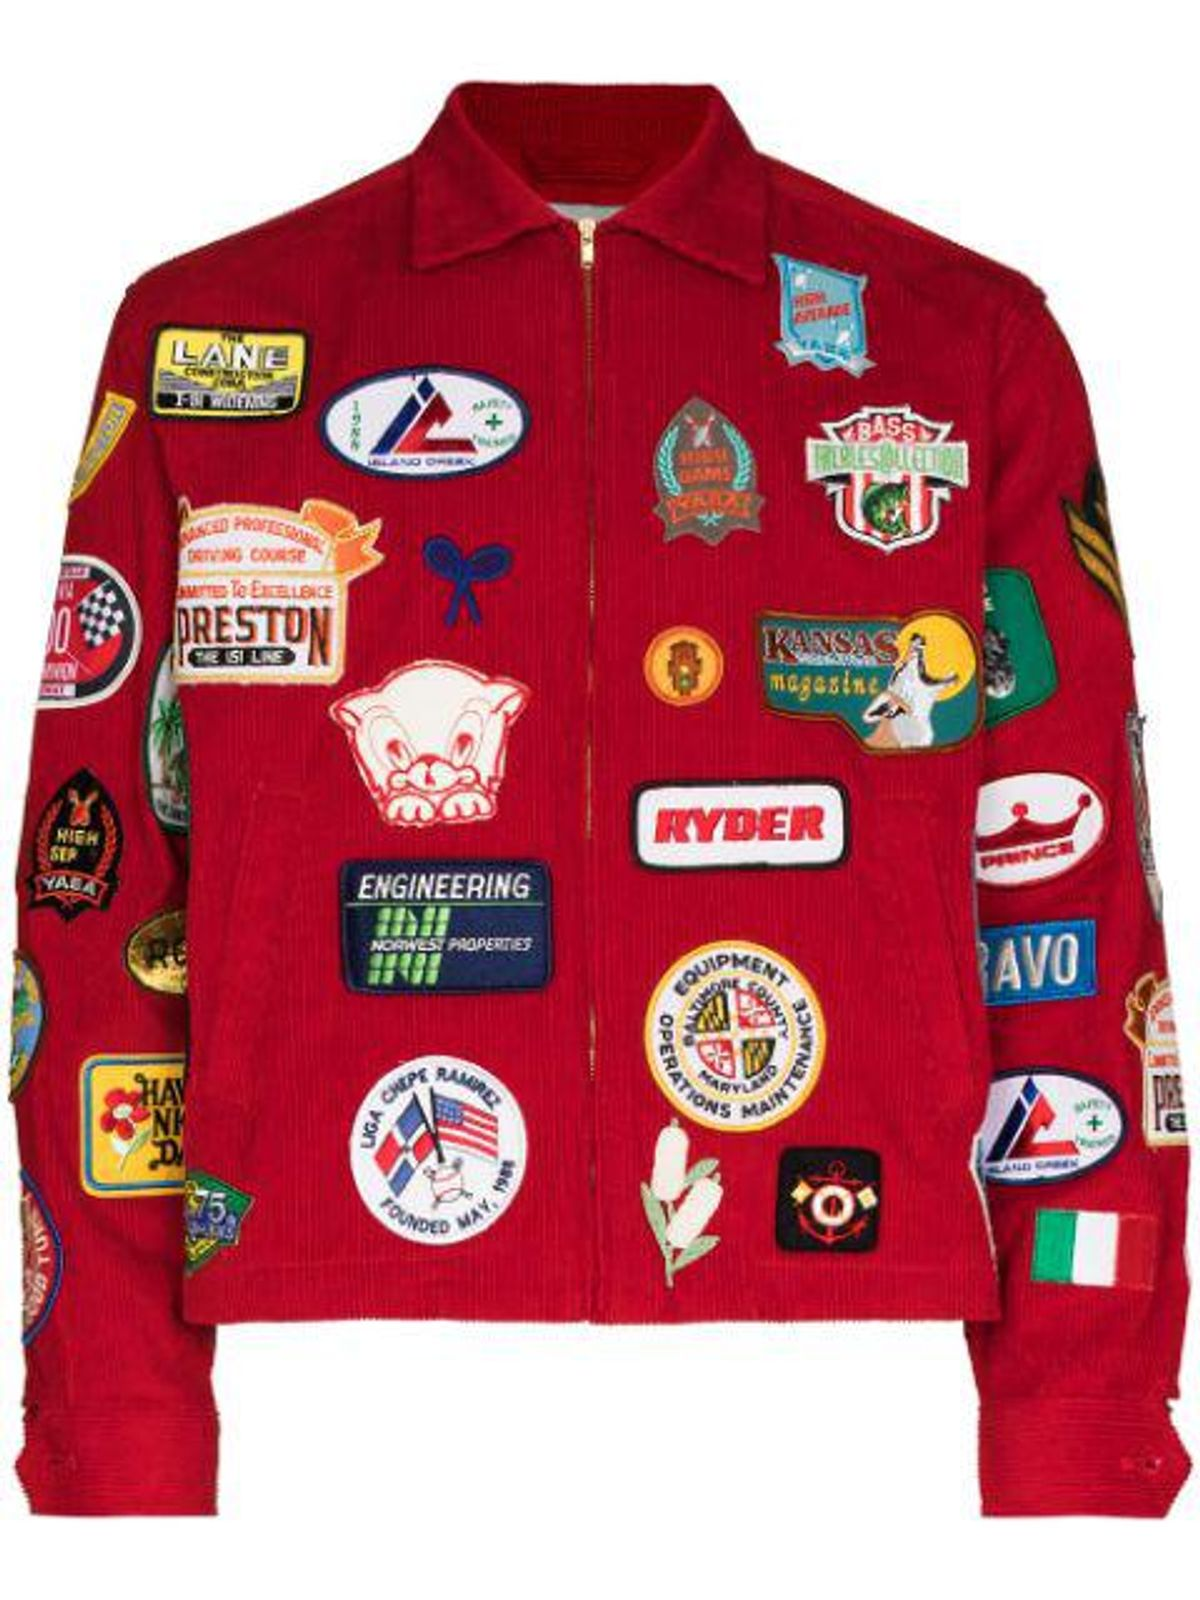 Multiple-patch Shirt Jacket